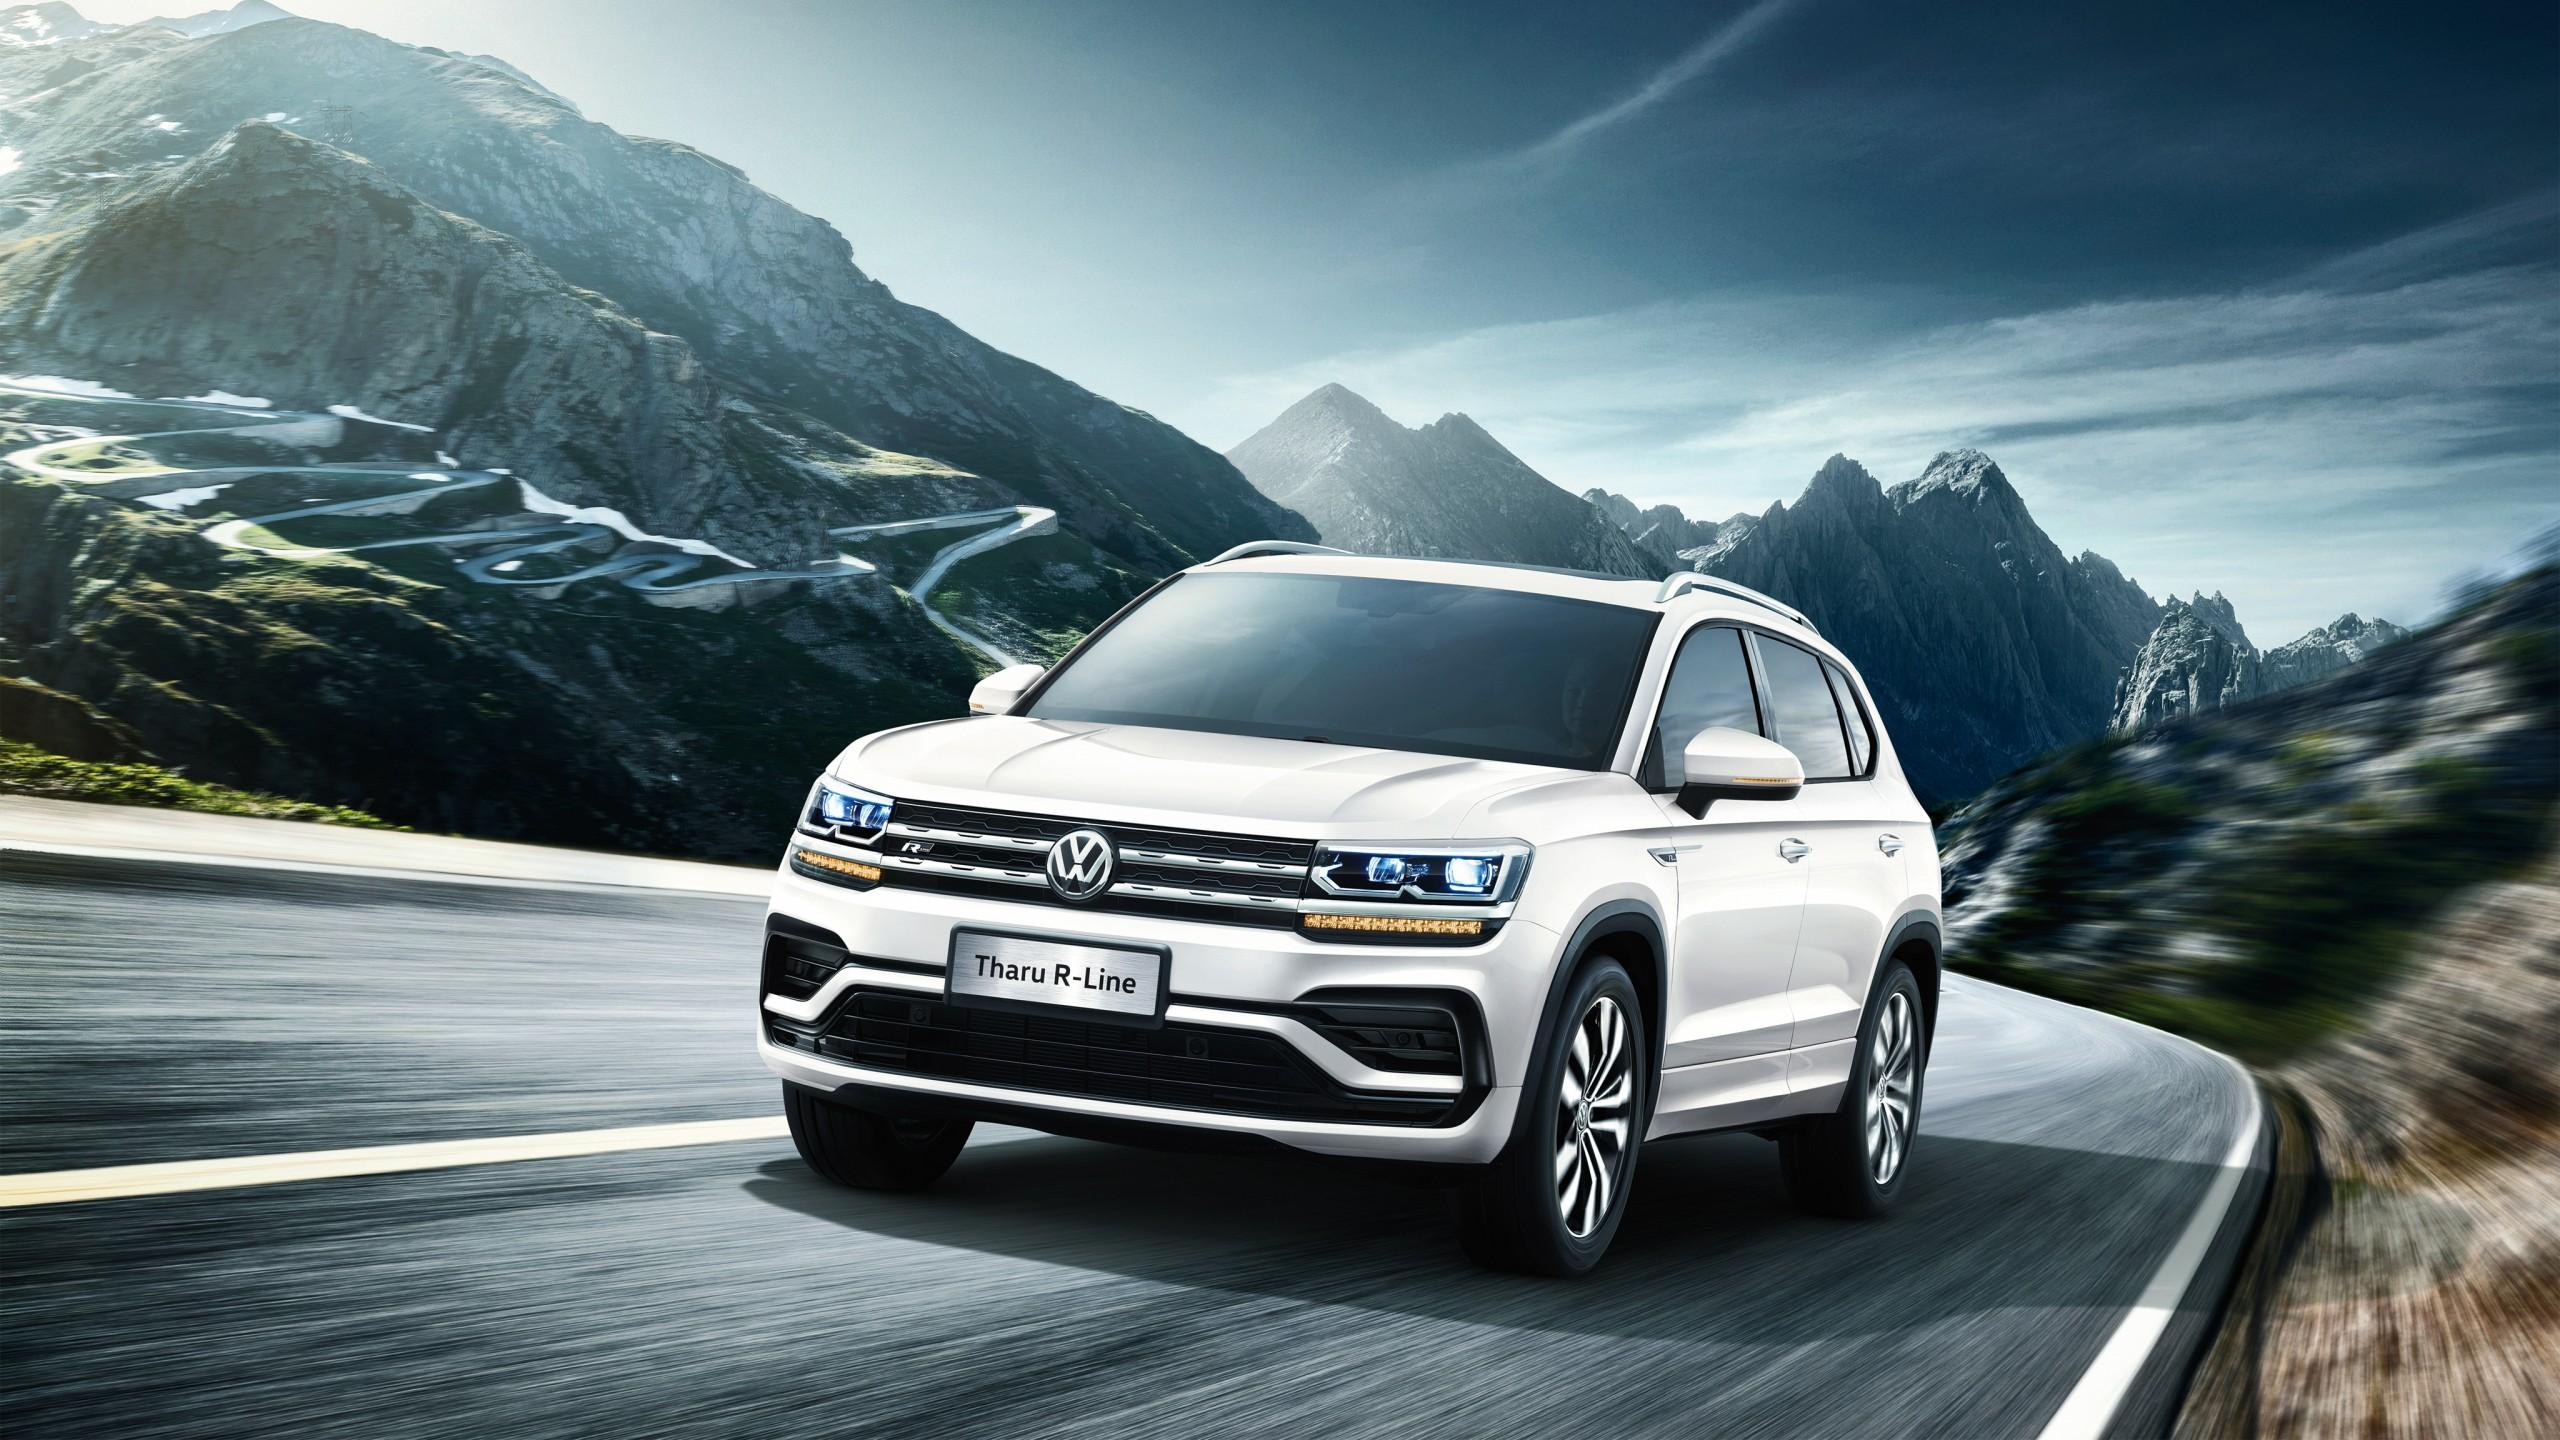 Volkswagen Tharu R-Line 2018 4K Wallpaper